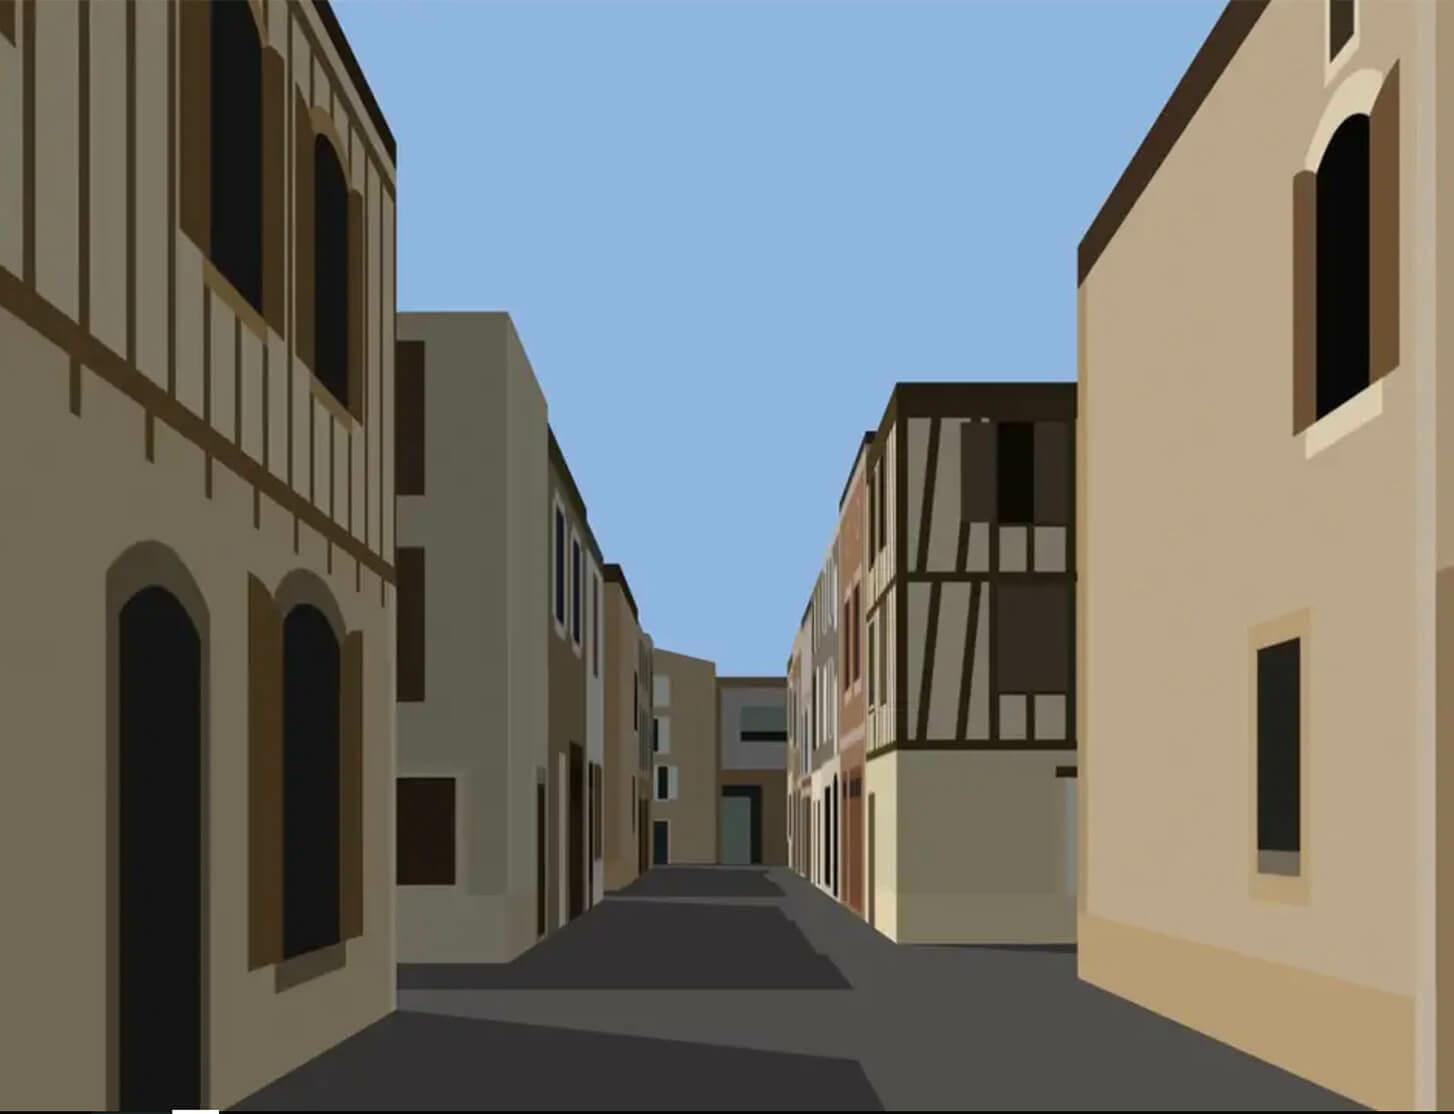 Julian Opie creates new digital artwork 'Village.'